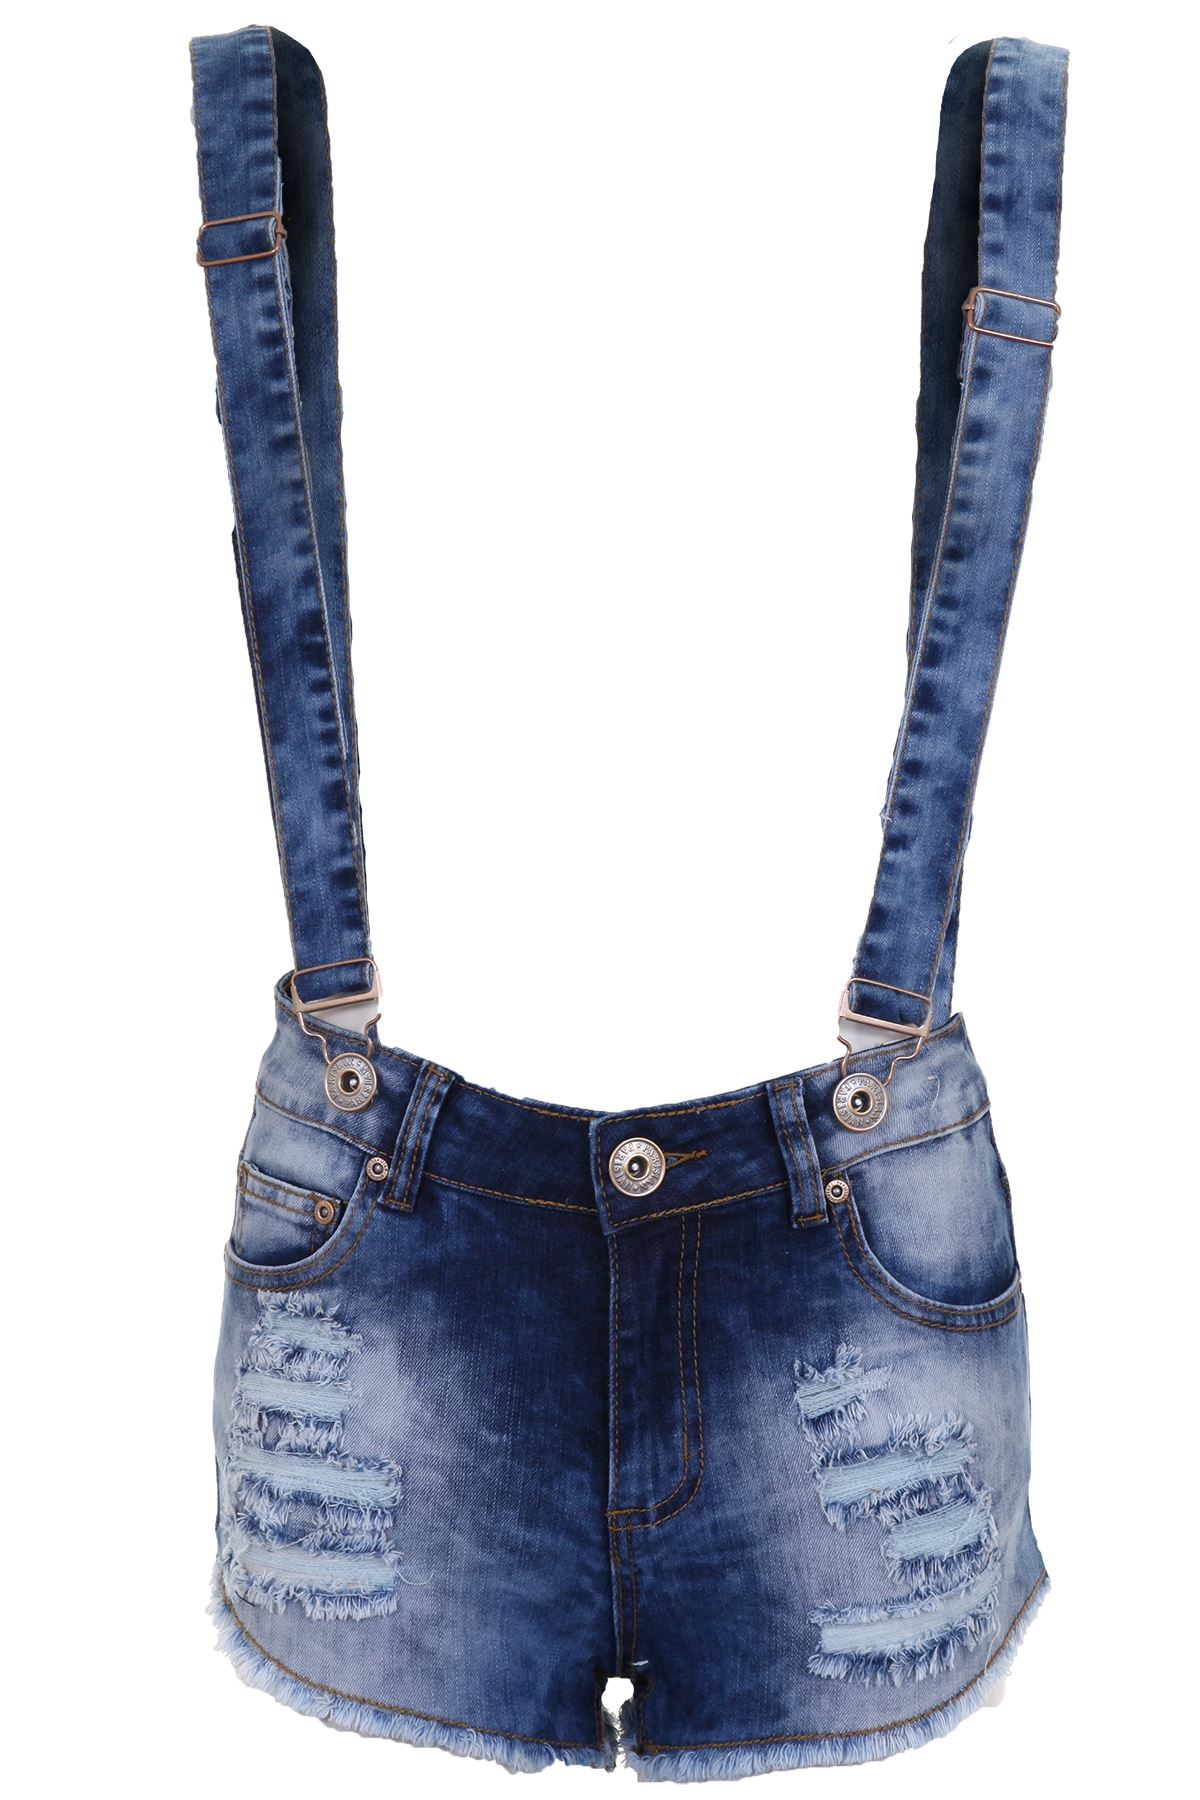 Women-039-s-Distressed-Denim-Brace-Frayed-Summer-Causal-Ladies-Shorts-Dungarees